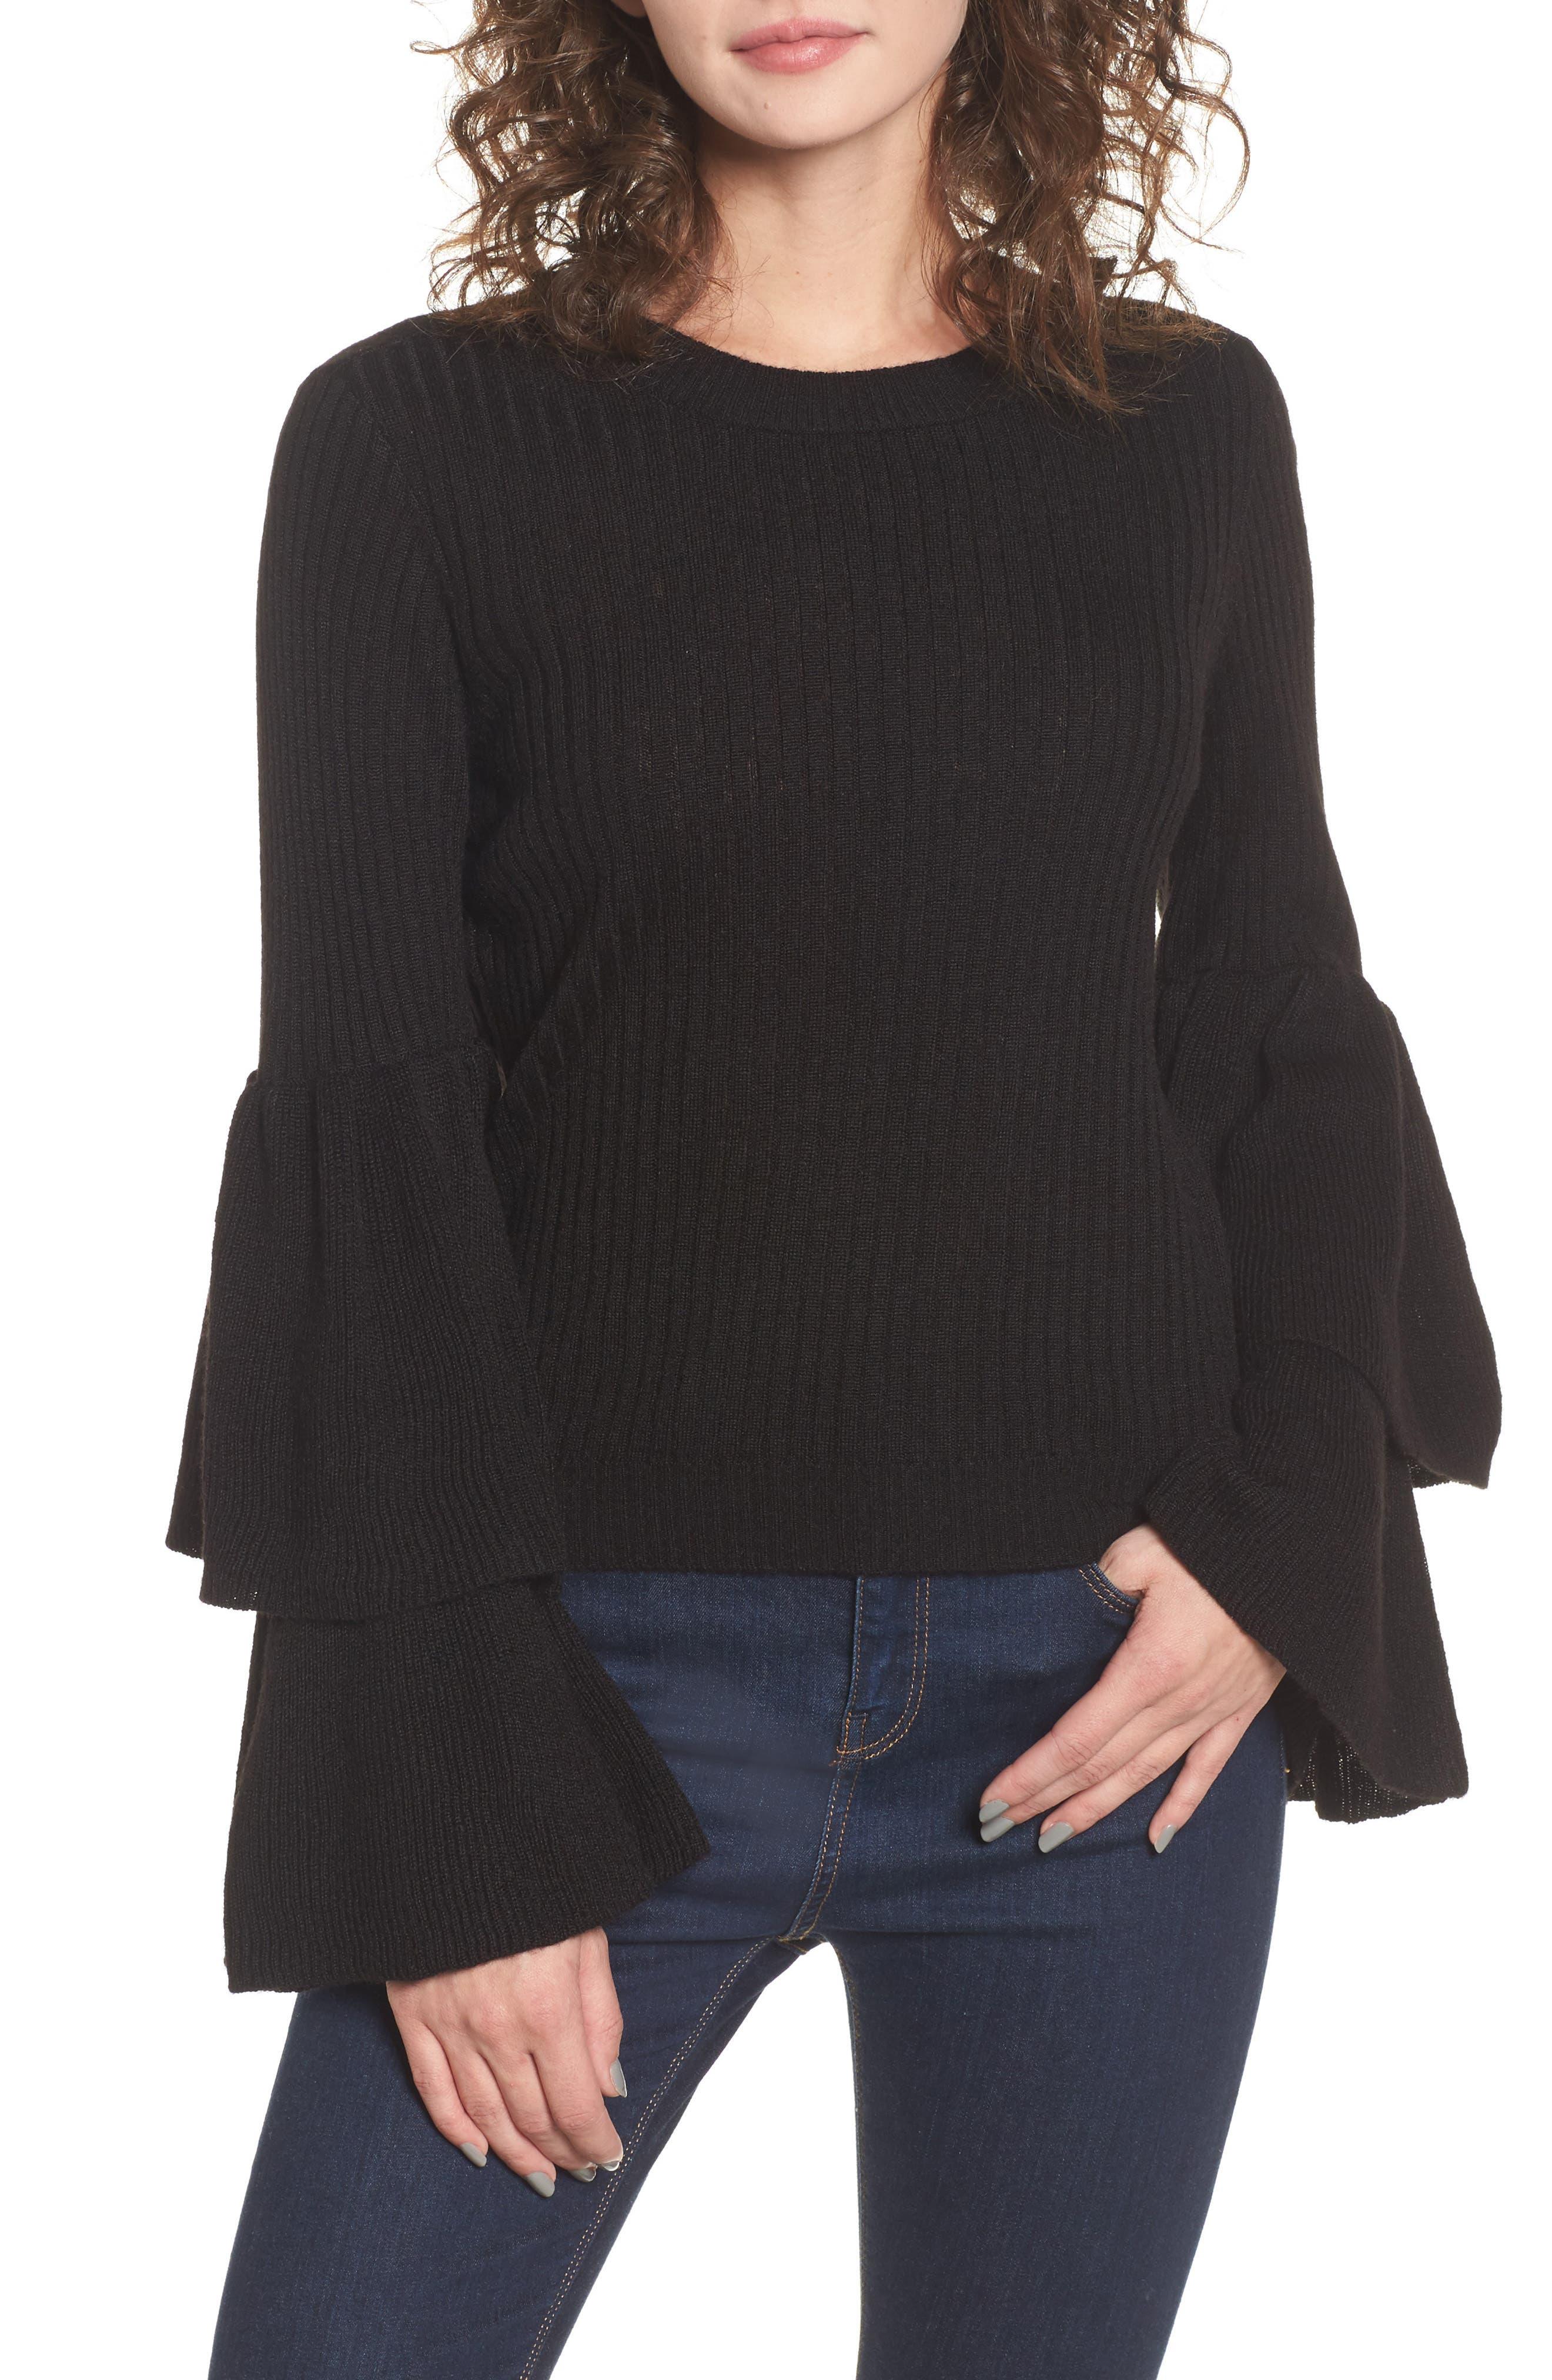 Tiara Bell Sleeve Sweater,                             Main thumbnail 1, color,                             001